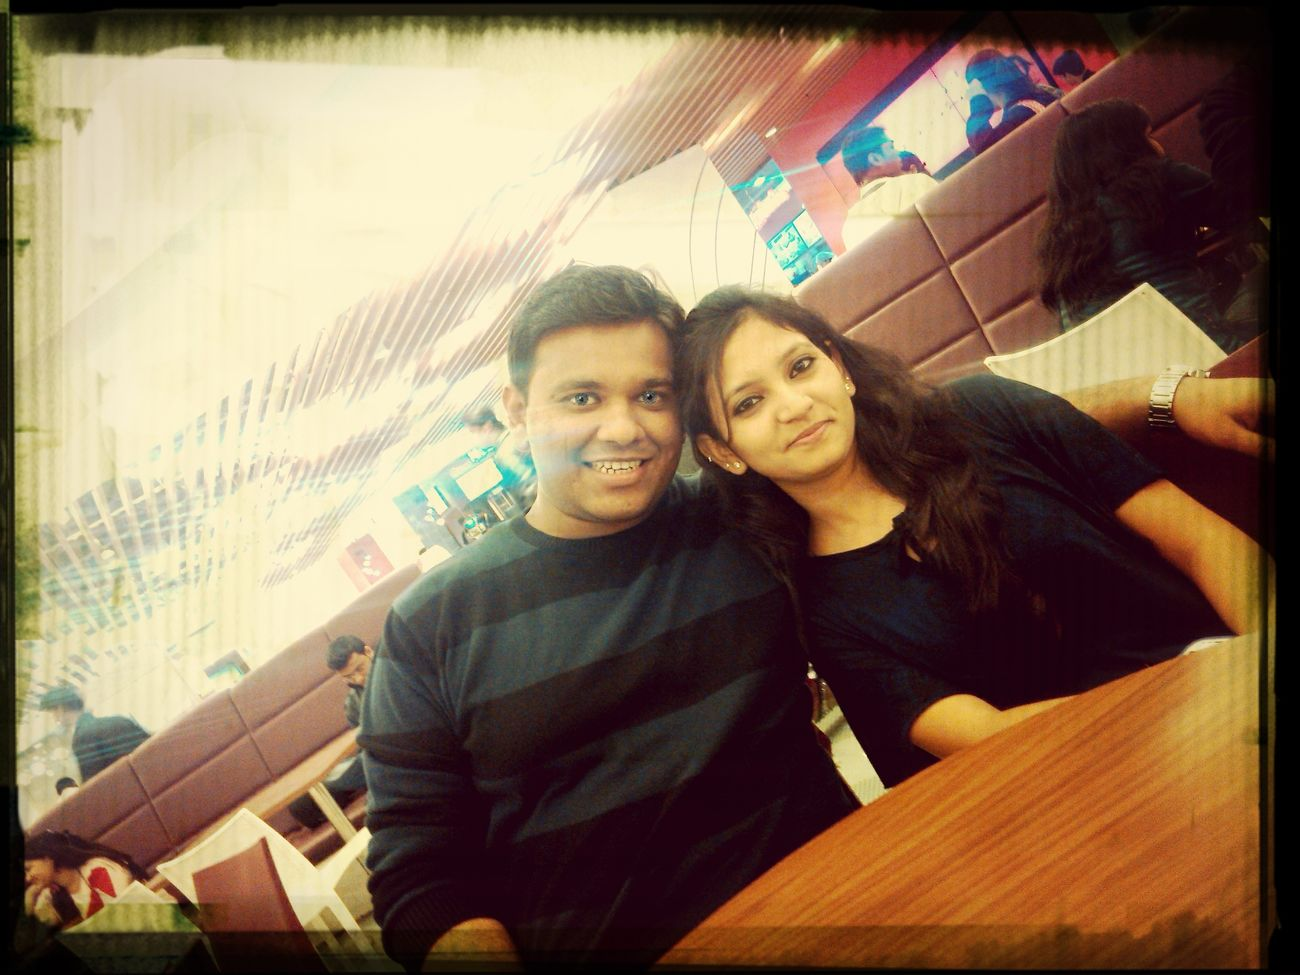 With mah.... Darling